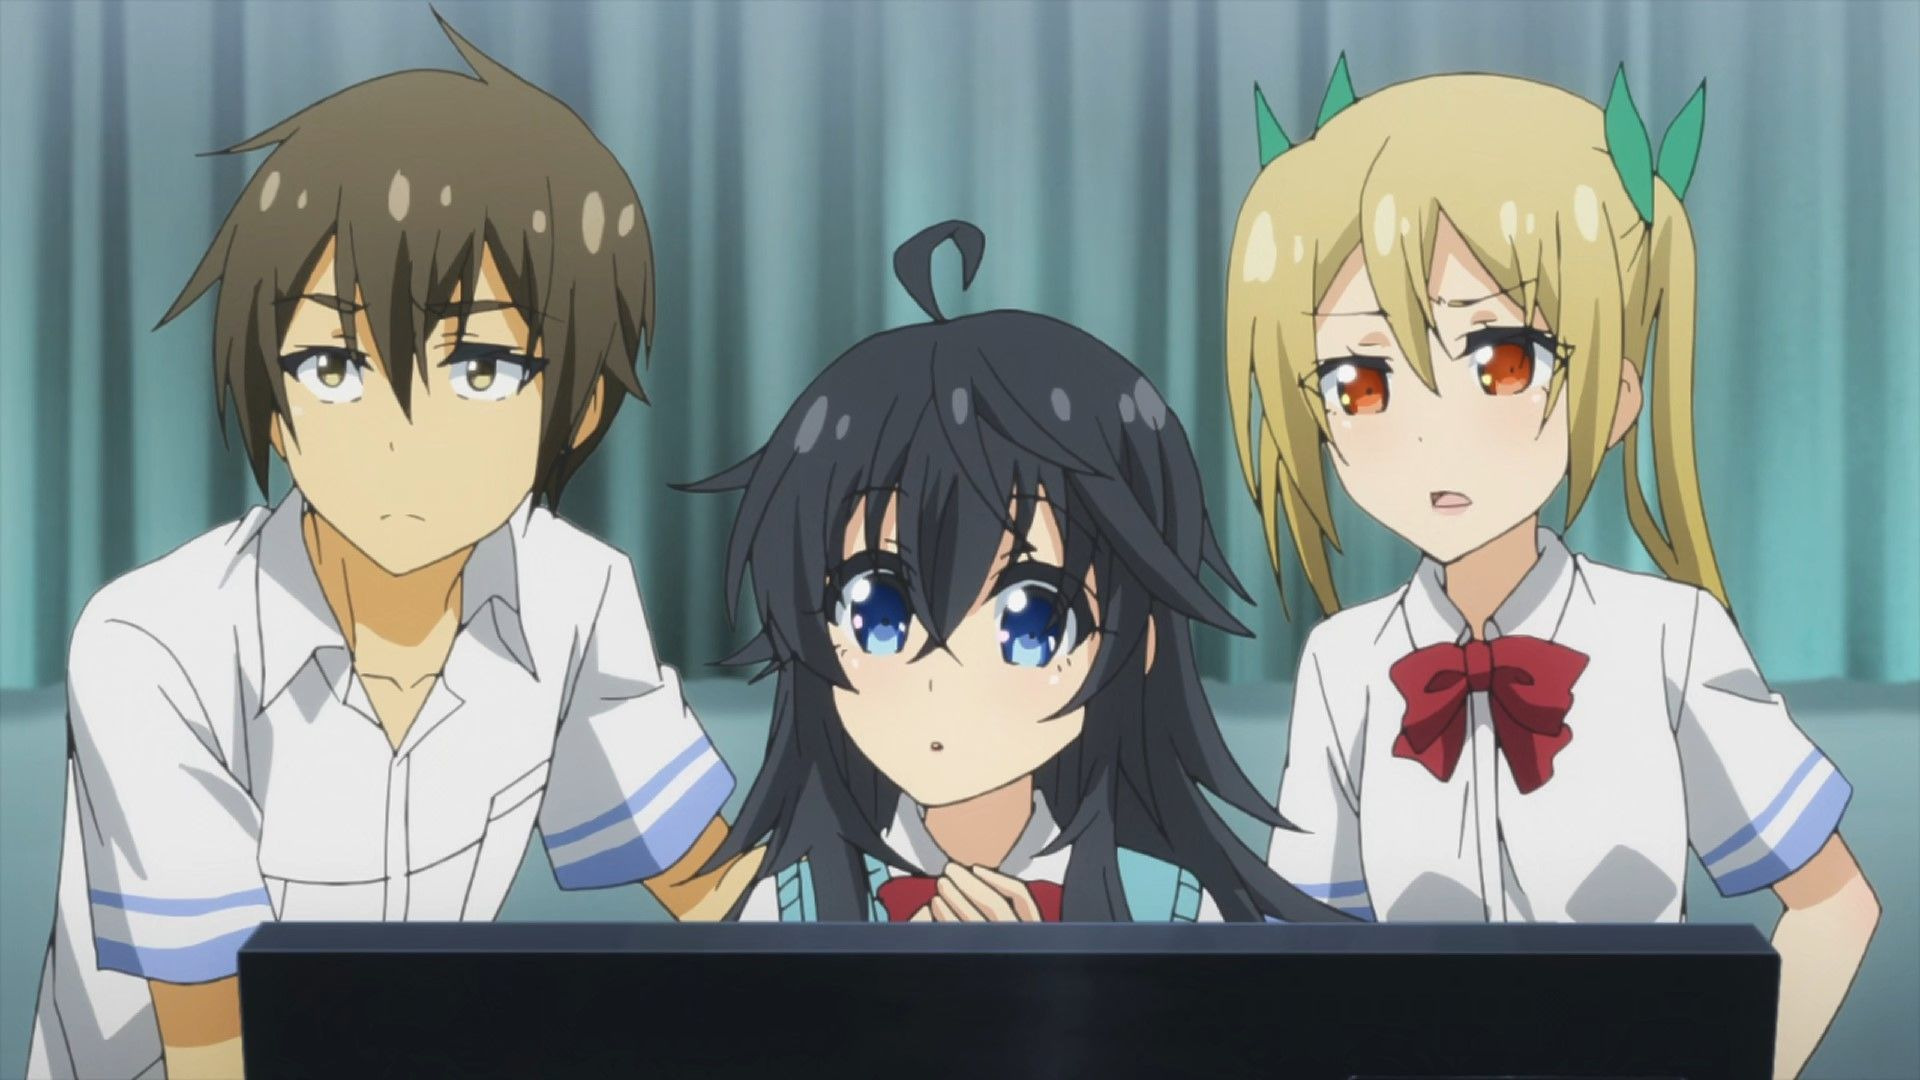 Netoge no Yome wa Onnanoko ja Nai to Omotta? — s01e03 — I Thought Net Games and Reality Were Different?